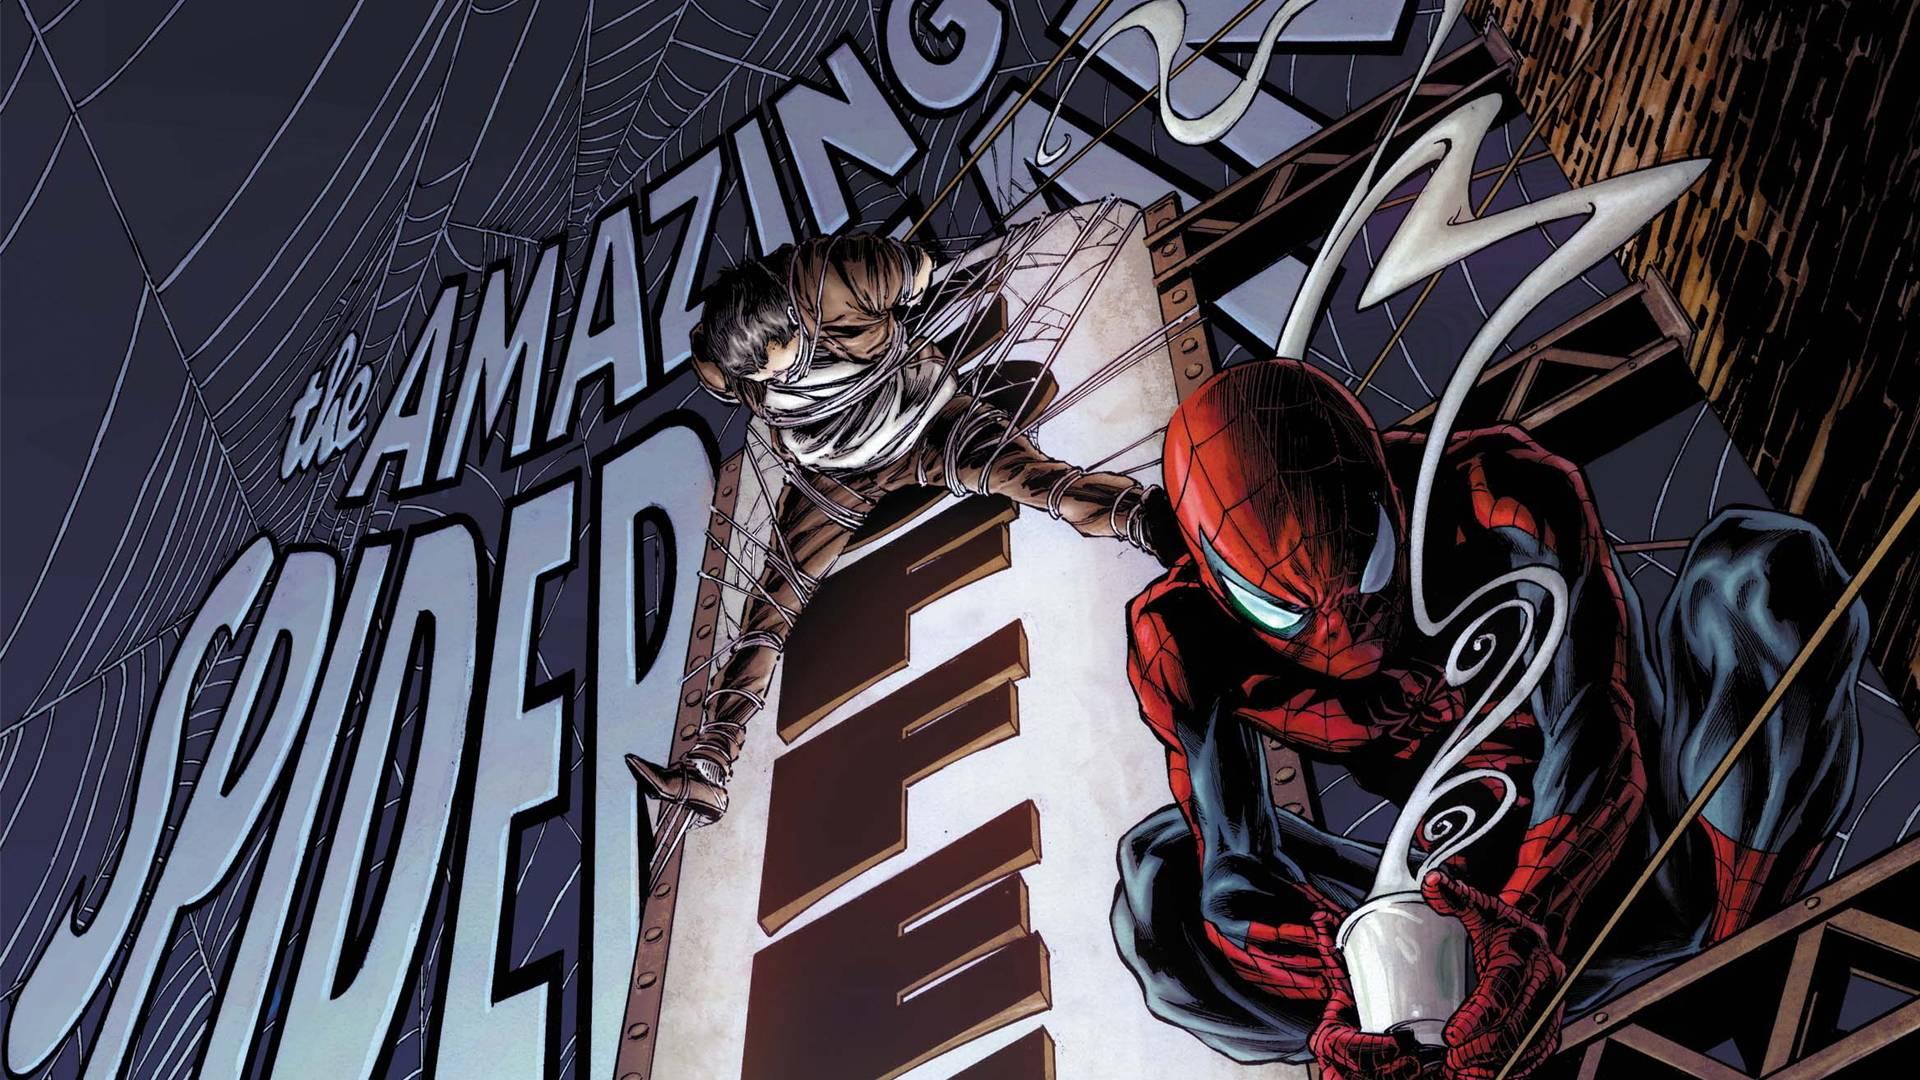 comic book wallpaper hd #12